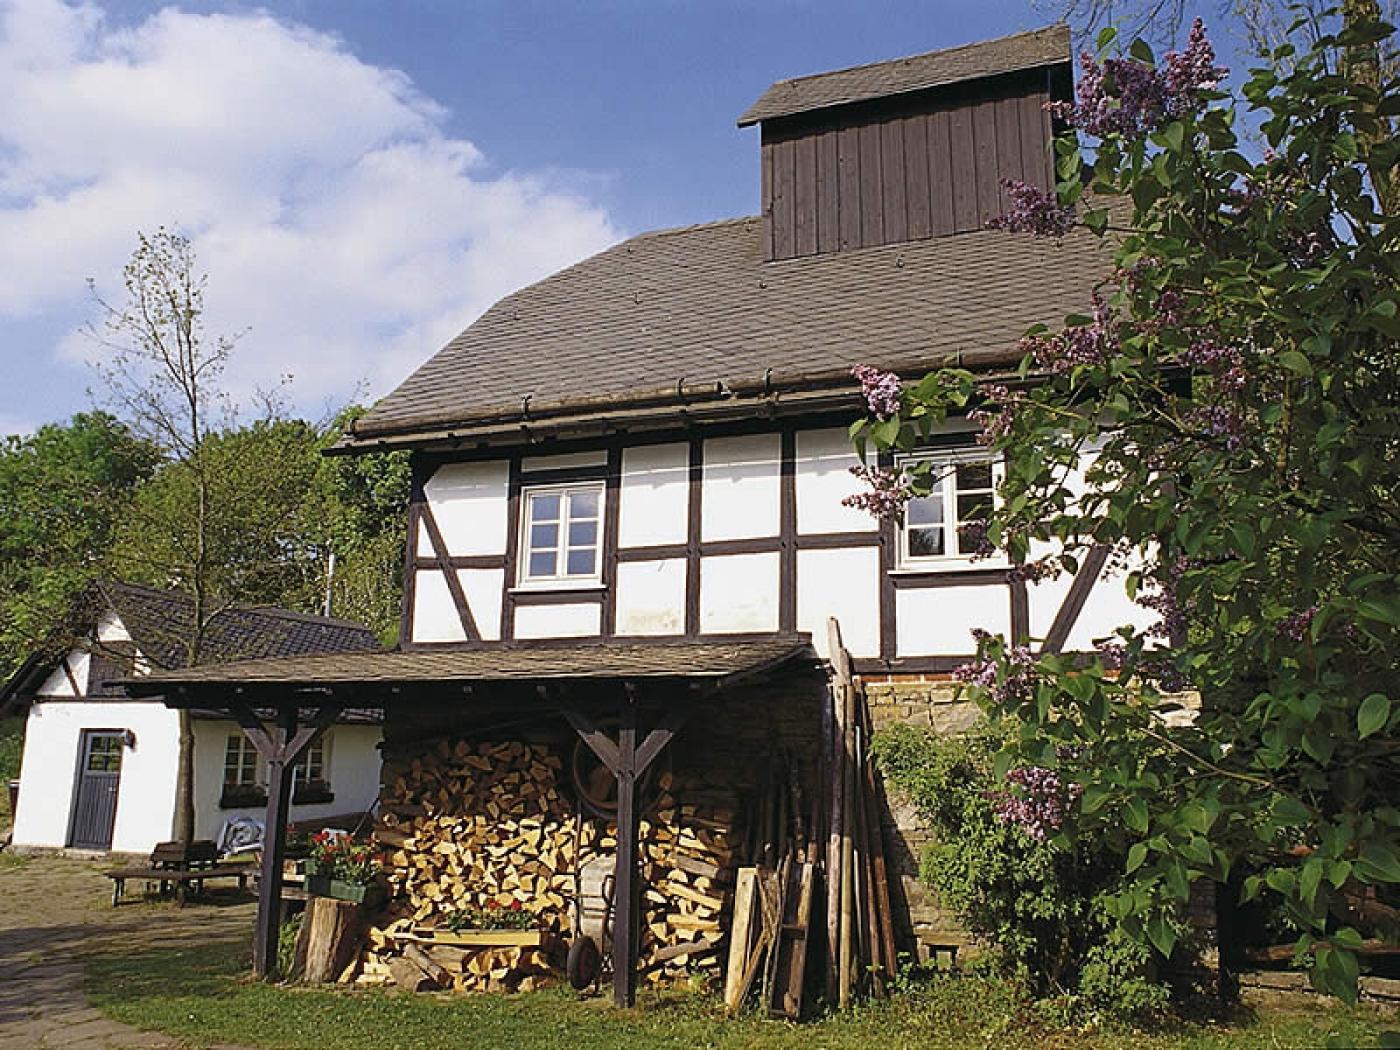 Alte Mühle bei Cobbenrode (Eslohe)